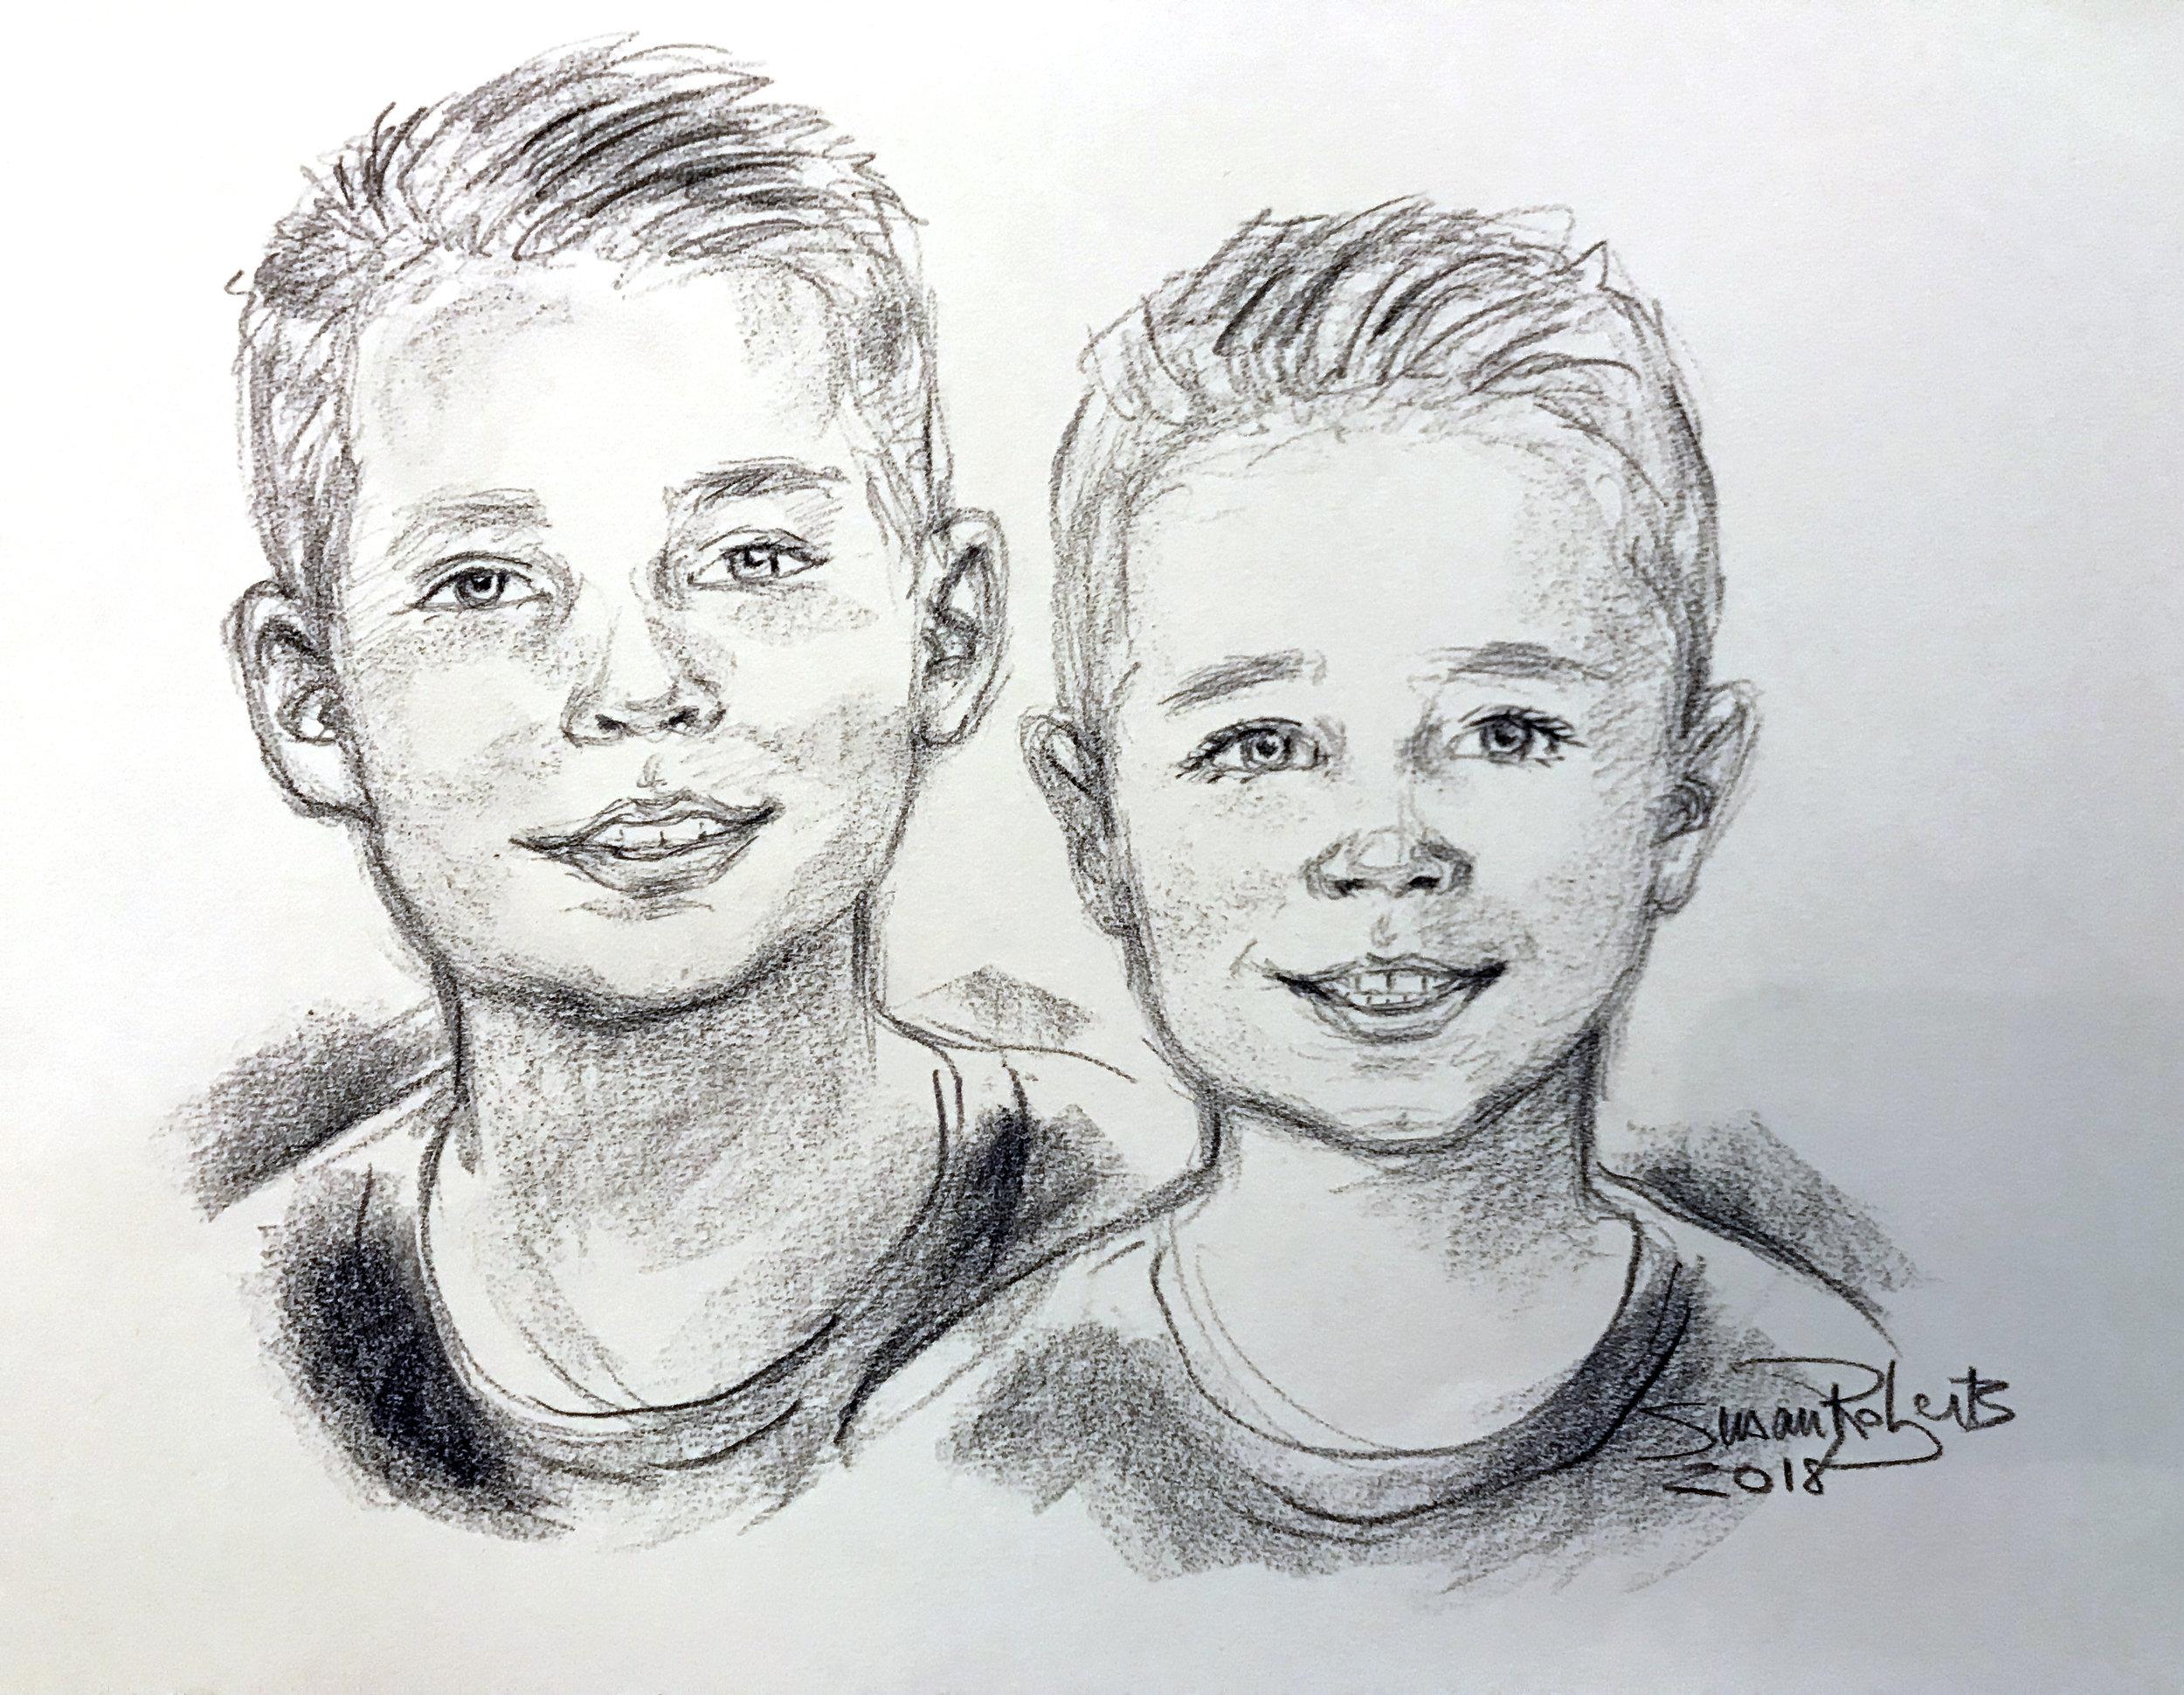 Group conte crayon portrait